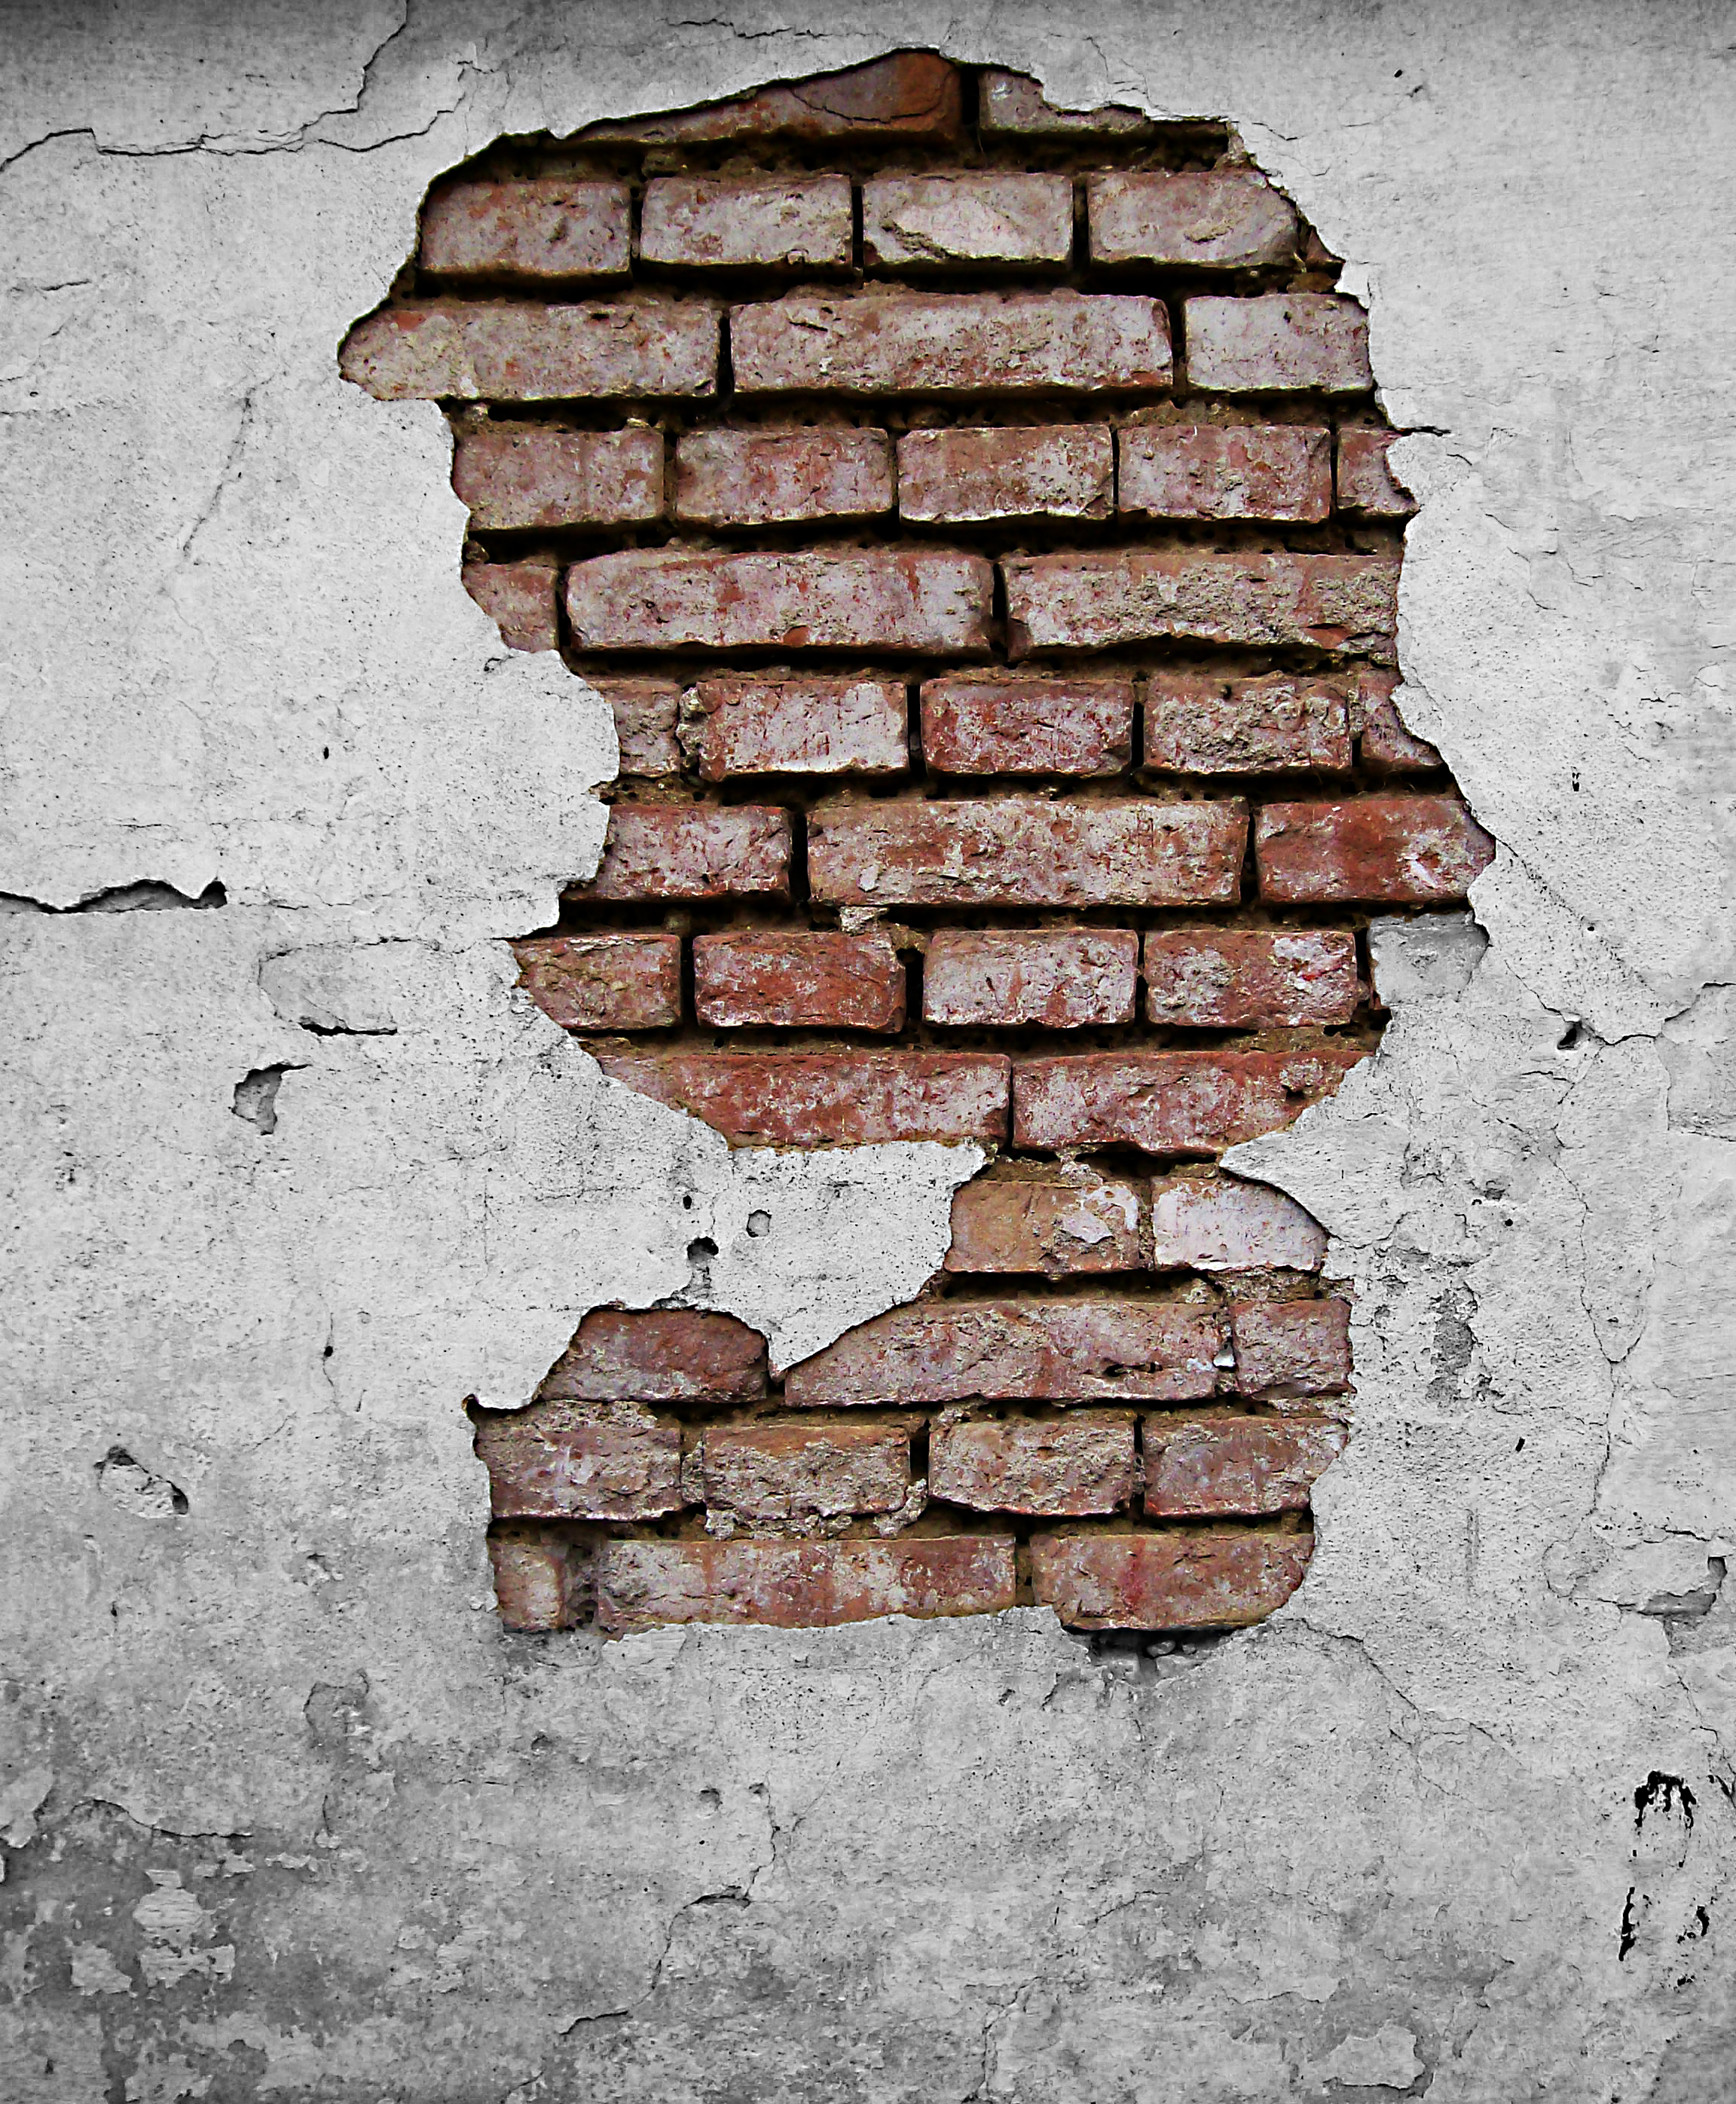 photodune-3417654-bricks-l